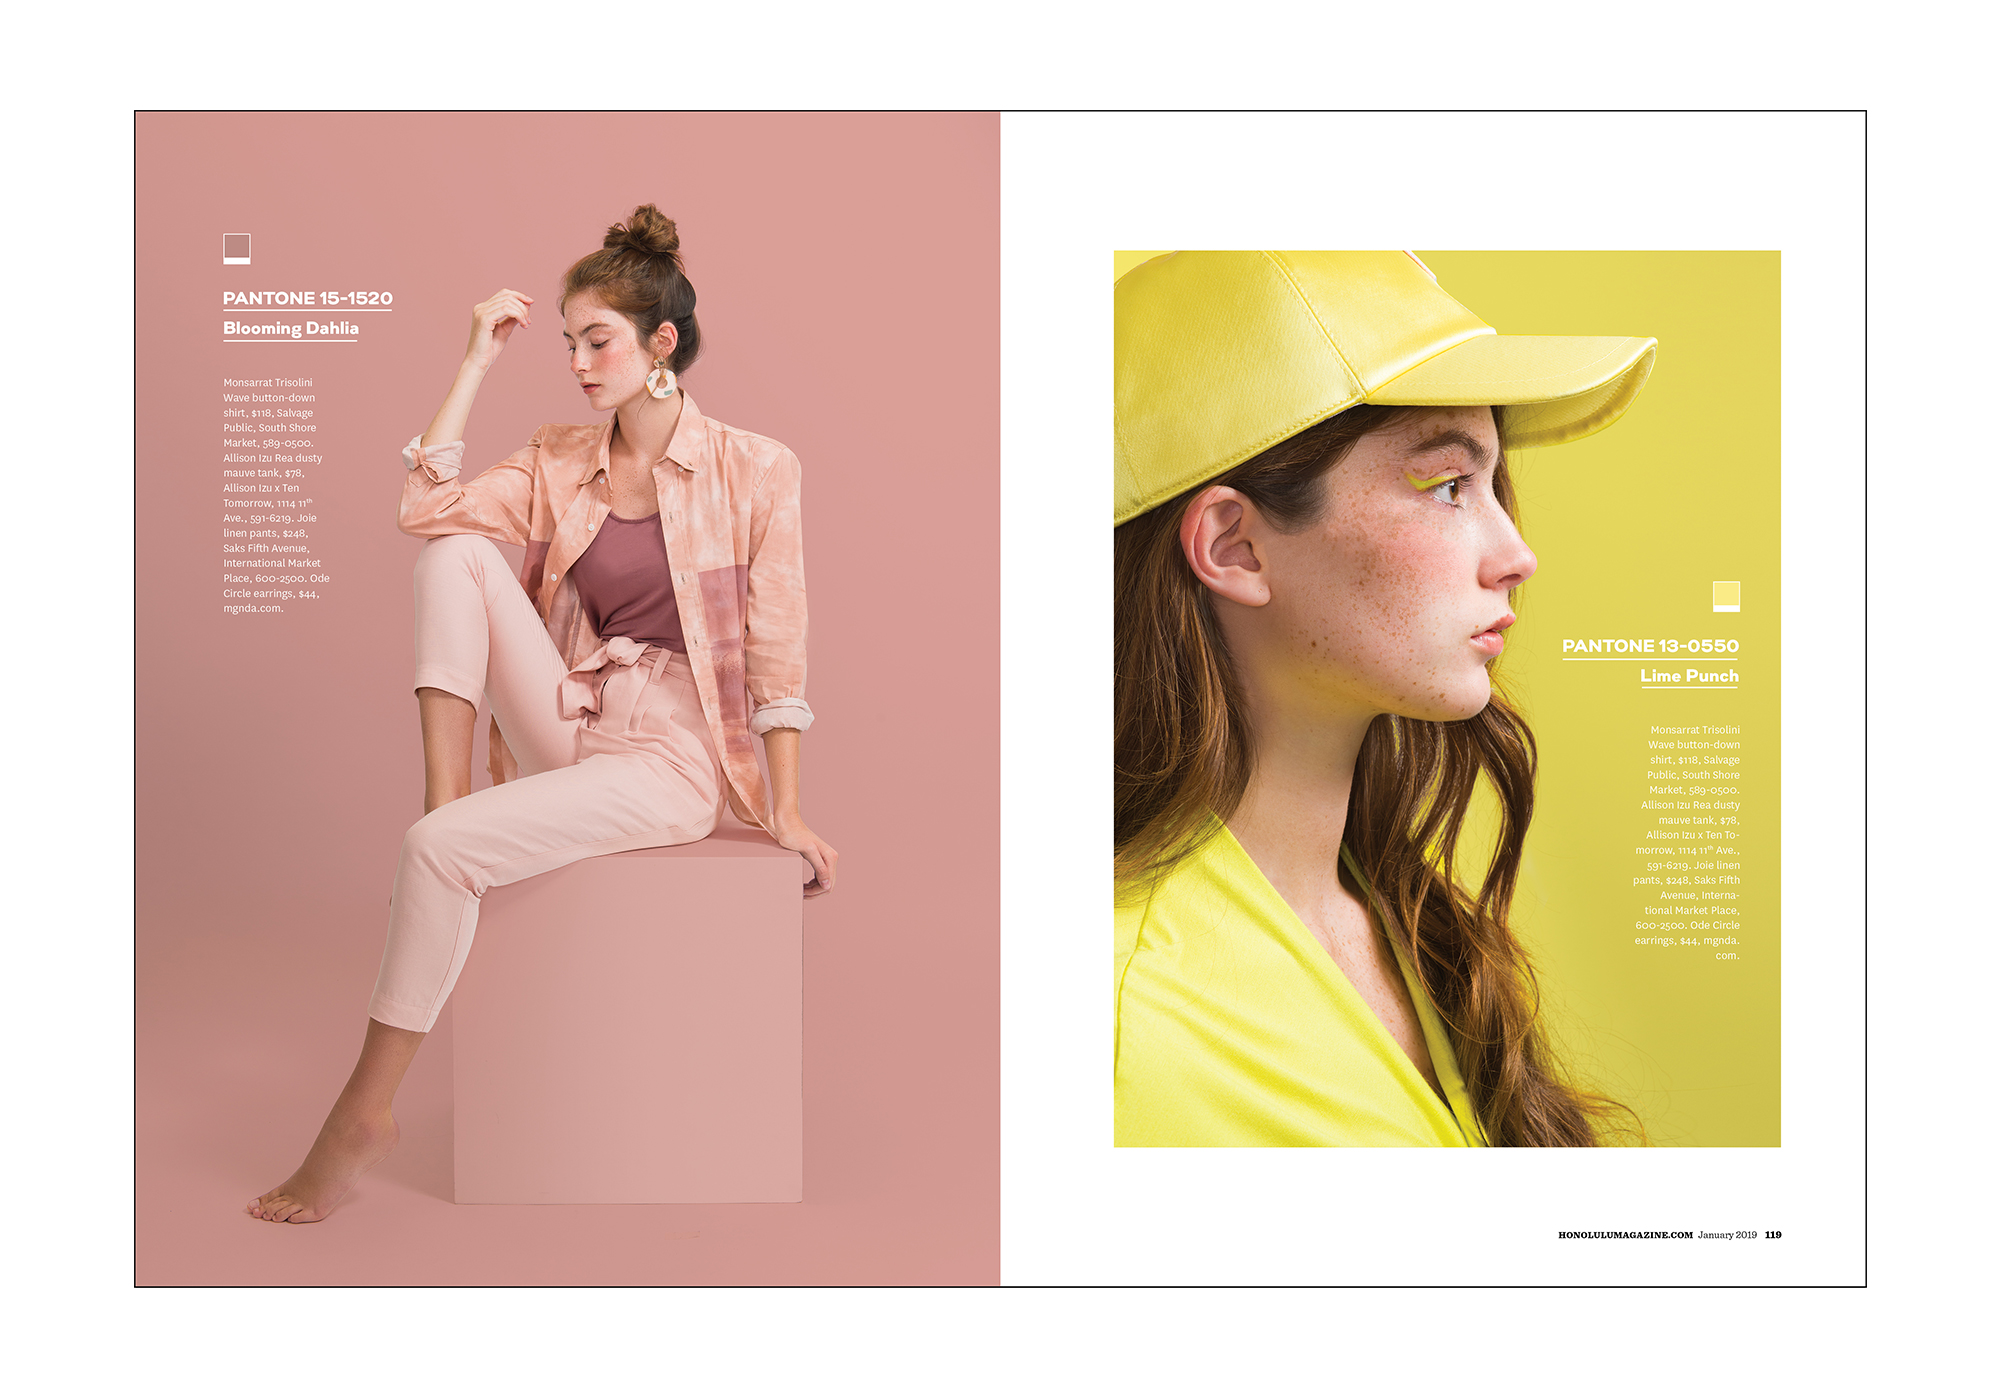 panton-color-story-2.jpg